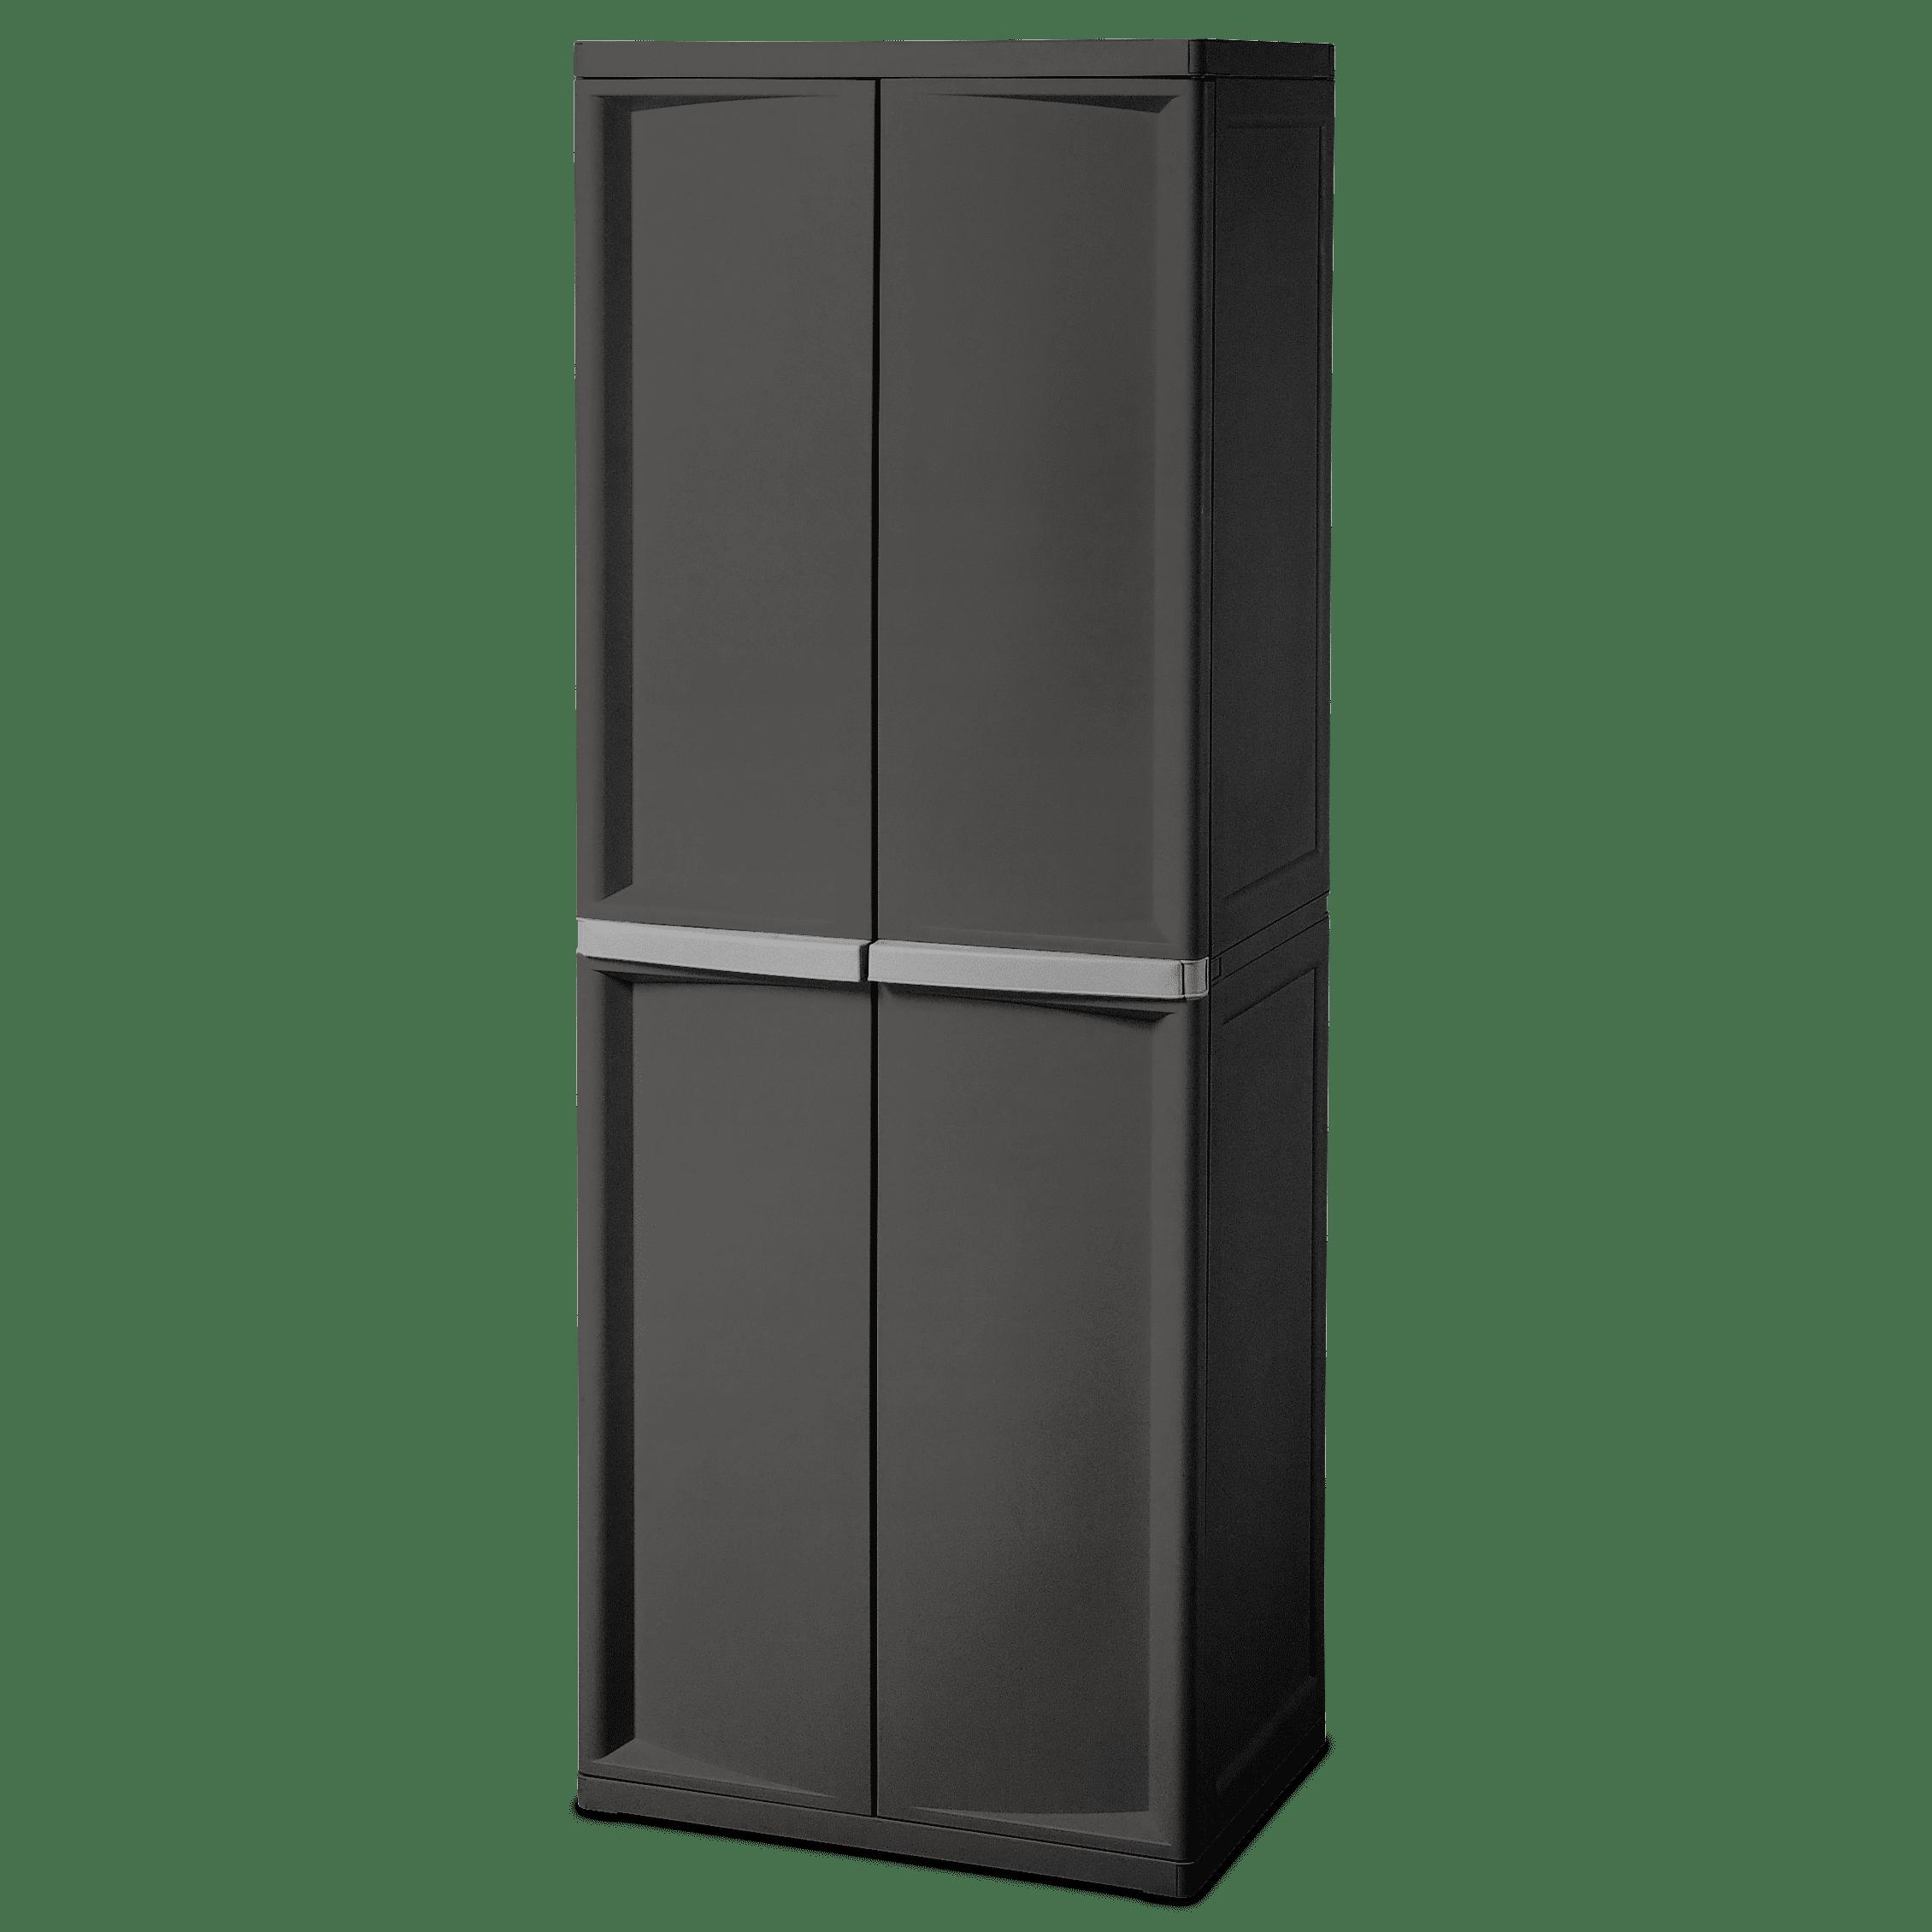 sterilite 4 shelf cabinet Sterilite 4 Shelf Cabinet, Flat Gray – Deal Info – BrickSeek sterilite 4 shelf cabinet